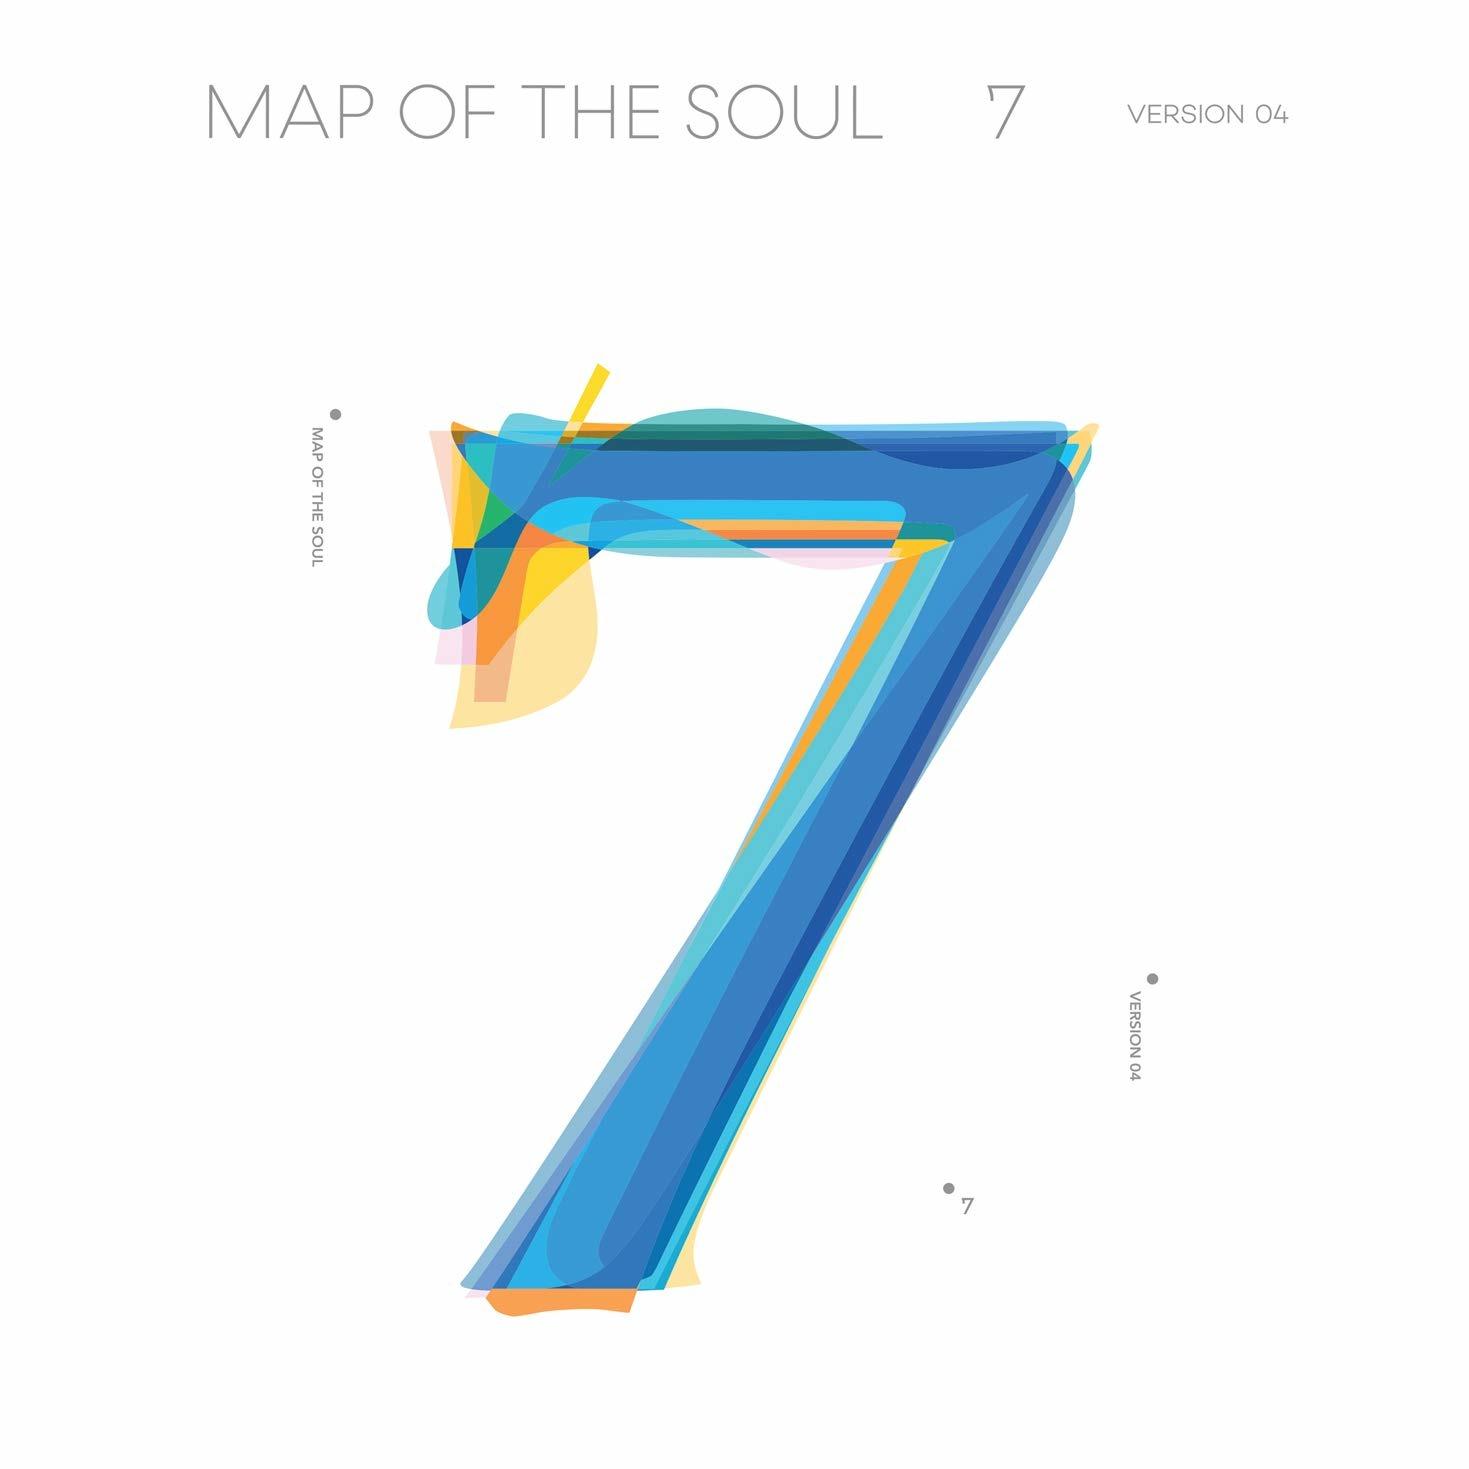 Bts-Map Of The Soul 7 (Version 4) - Bts-Map Of The Soul 7 (Version 4) - Musik - BIGHIT ENTERTAINMENT - 0194491757960 - 1970